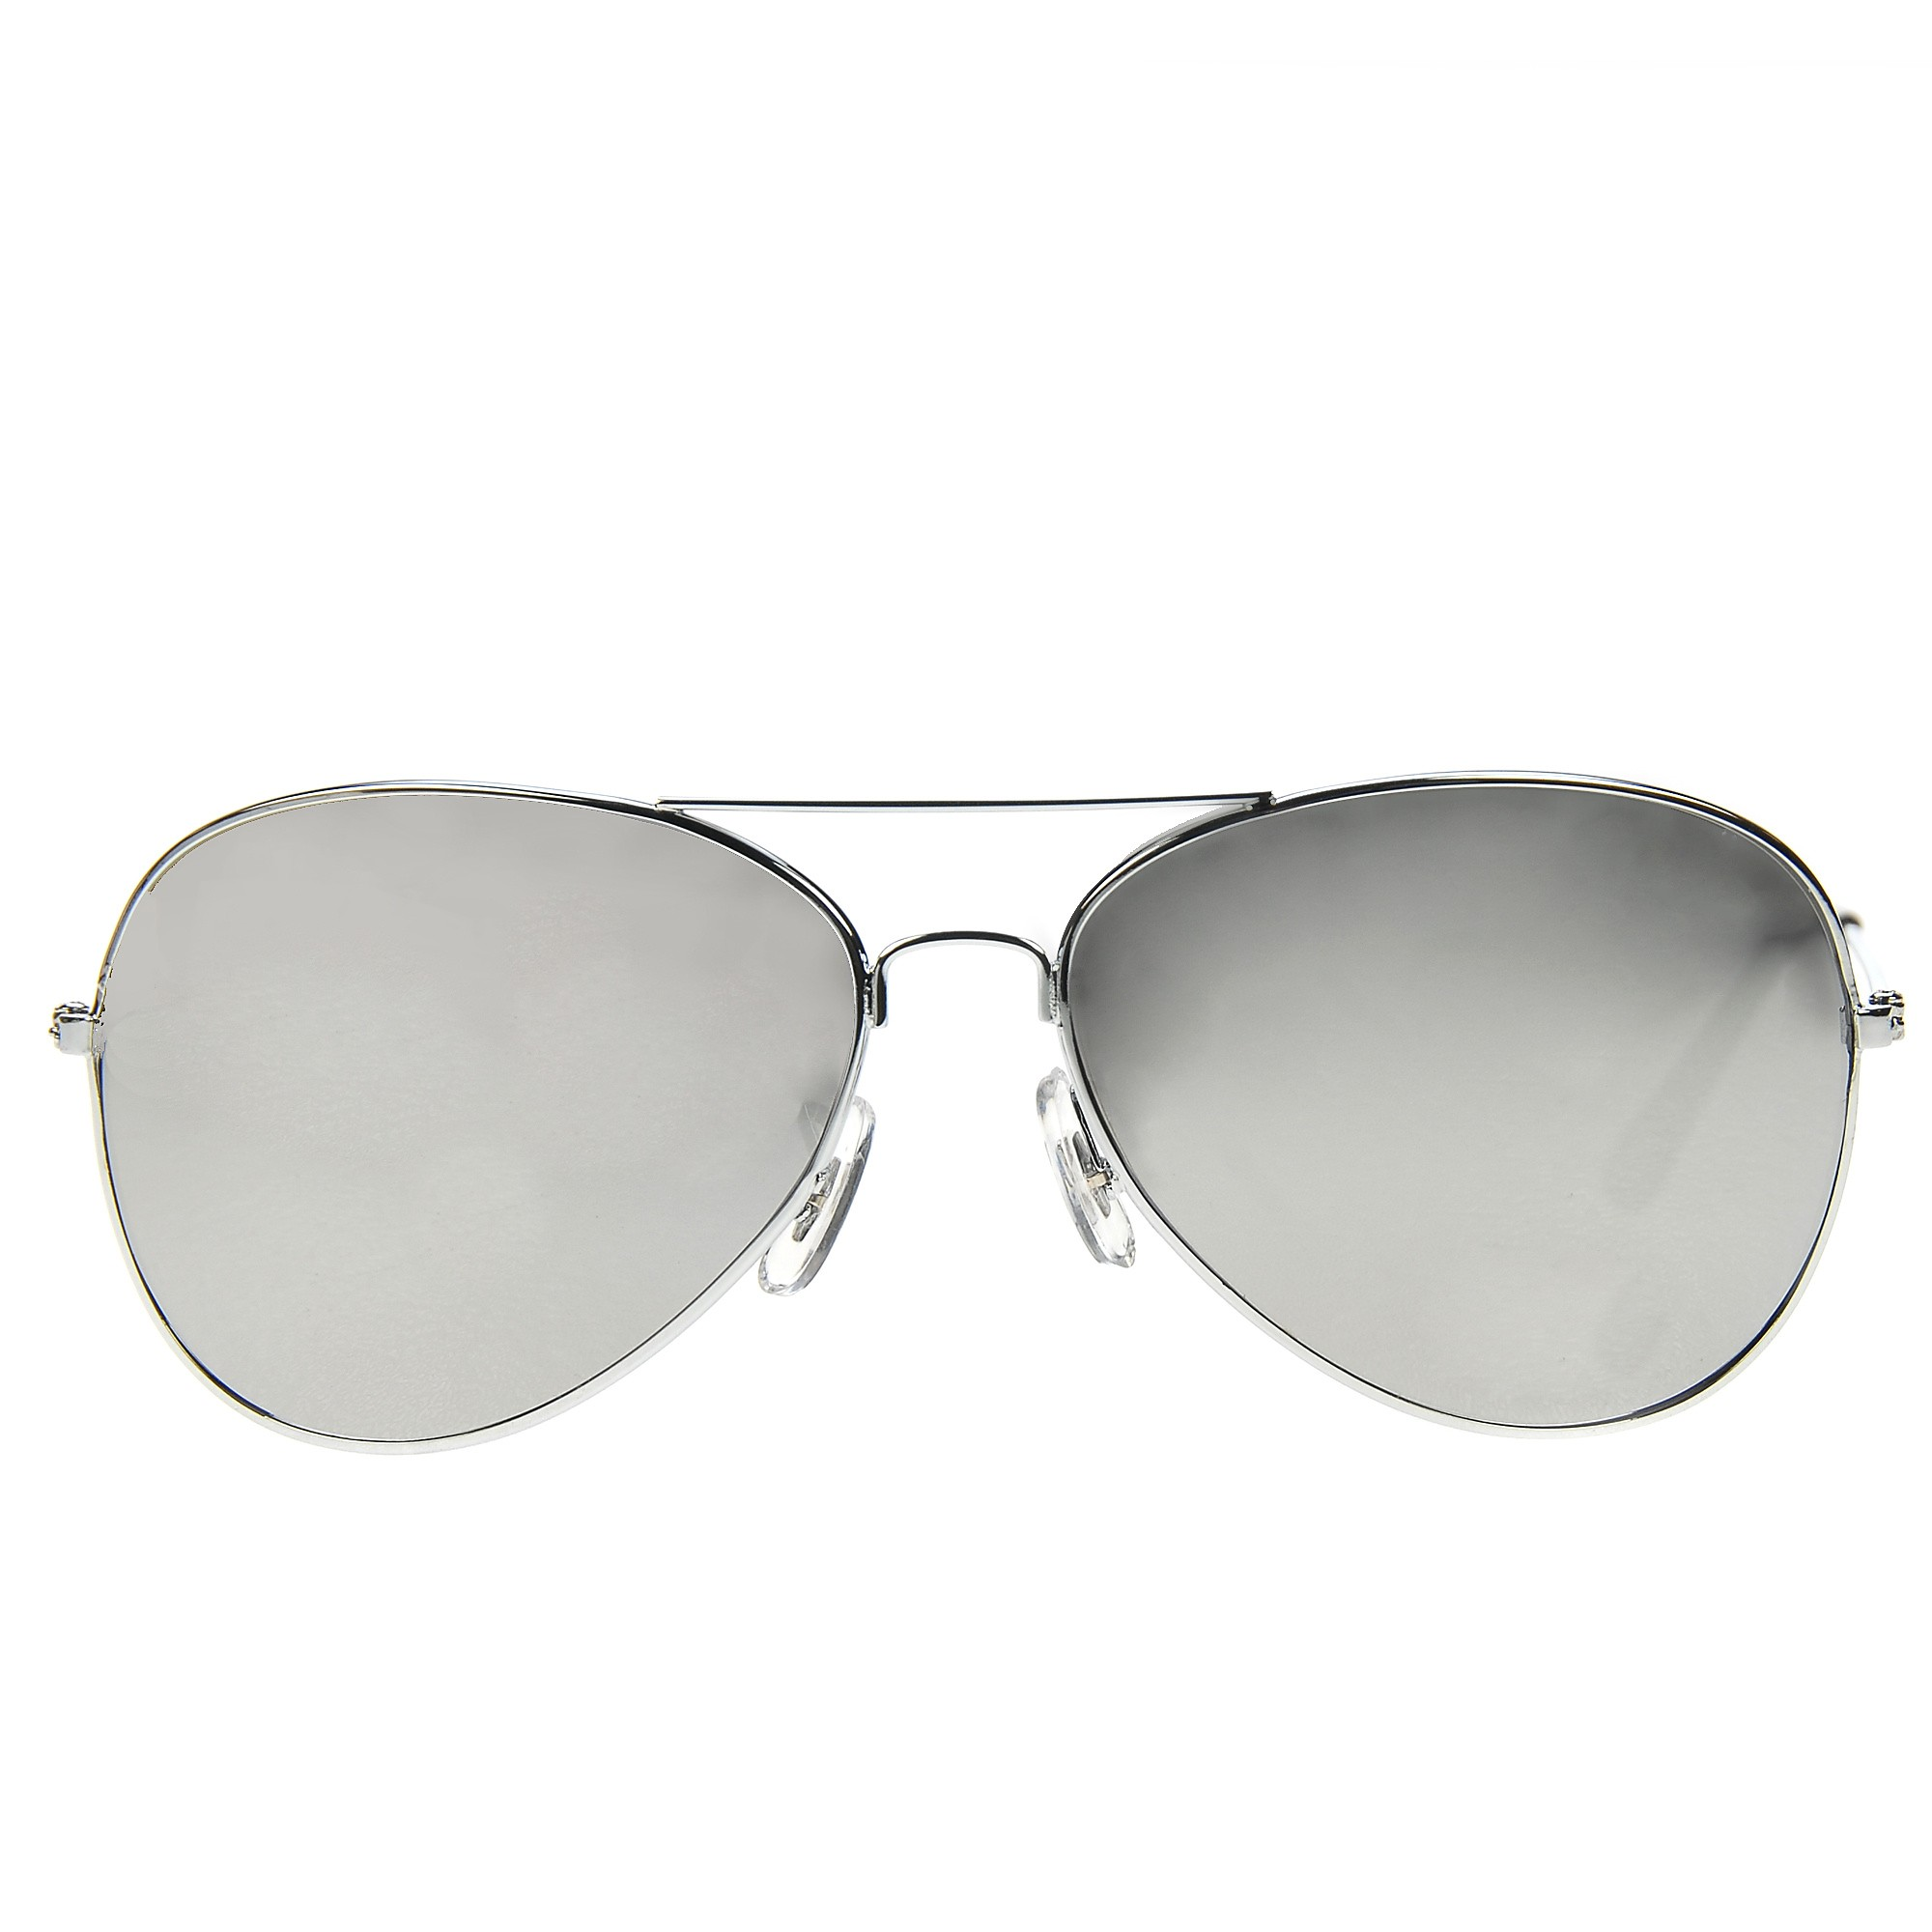 McKenzie Carnation Sunglasses